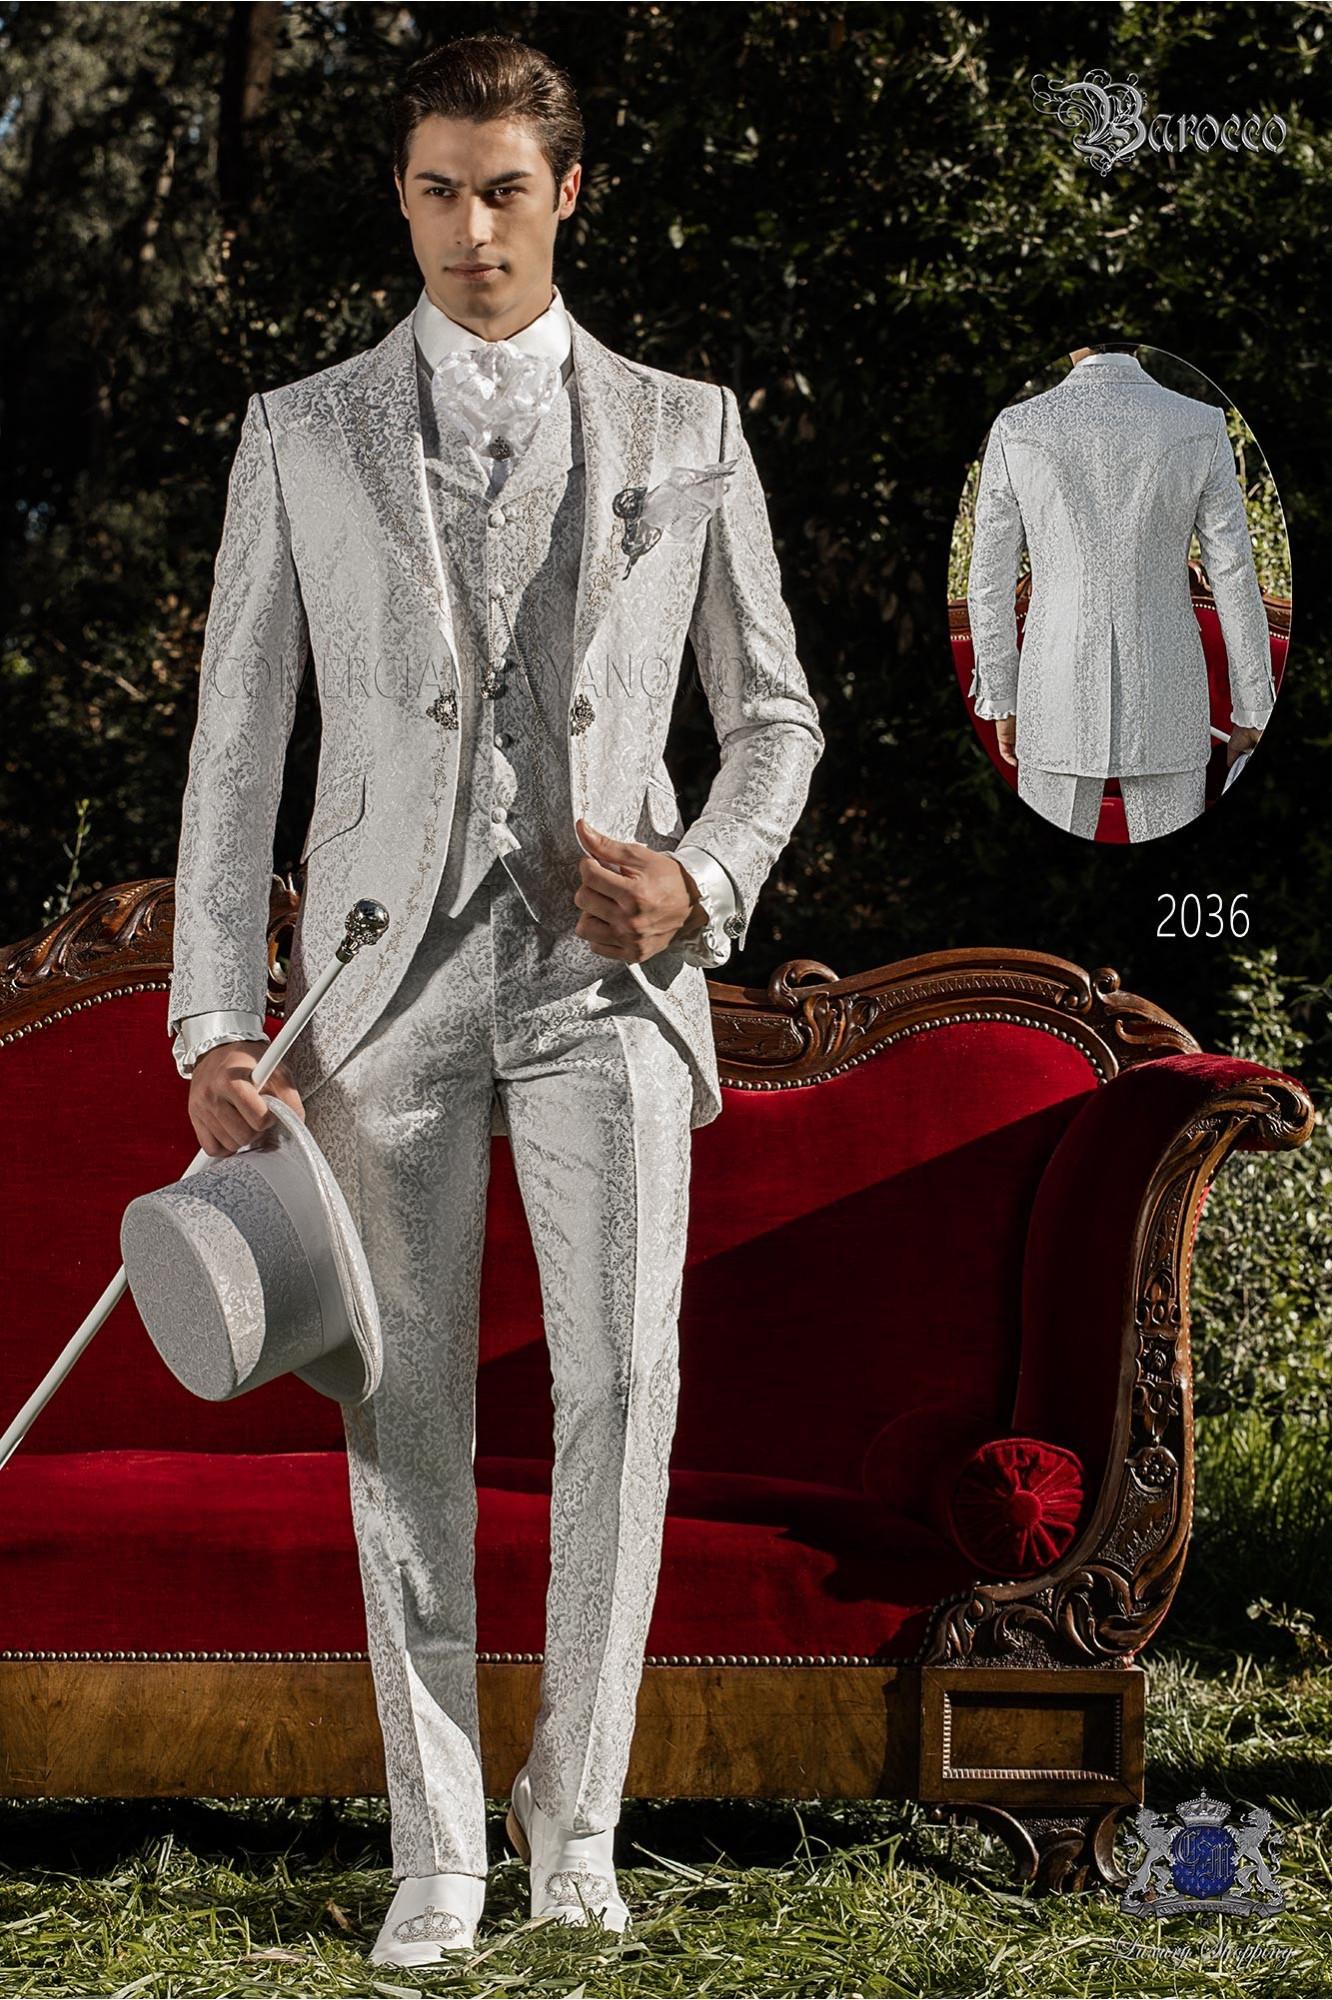 Likeable Bräutigam Vintage Collection Of Barocker Bräutigam Anzug, Gehrock In Perlgrauer Jacquard